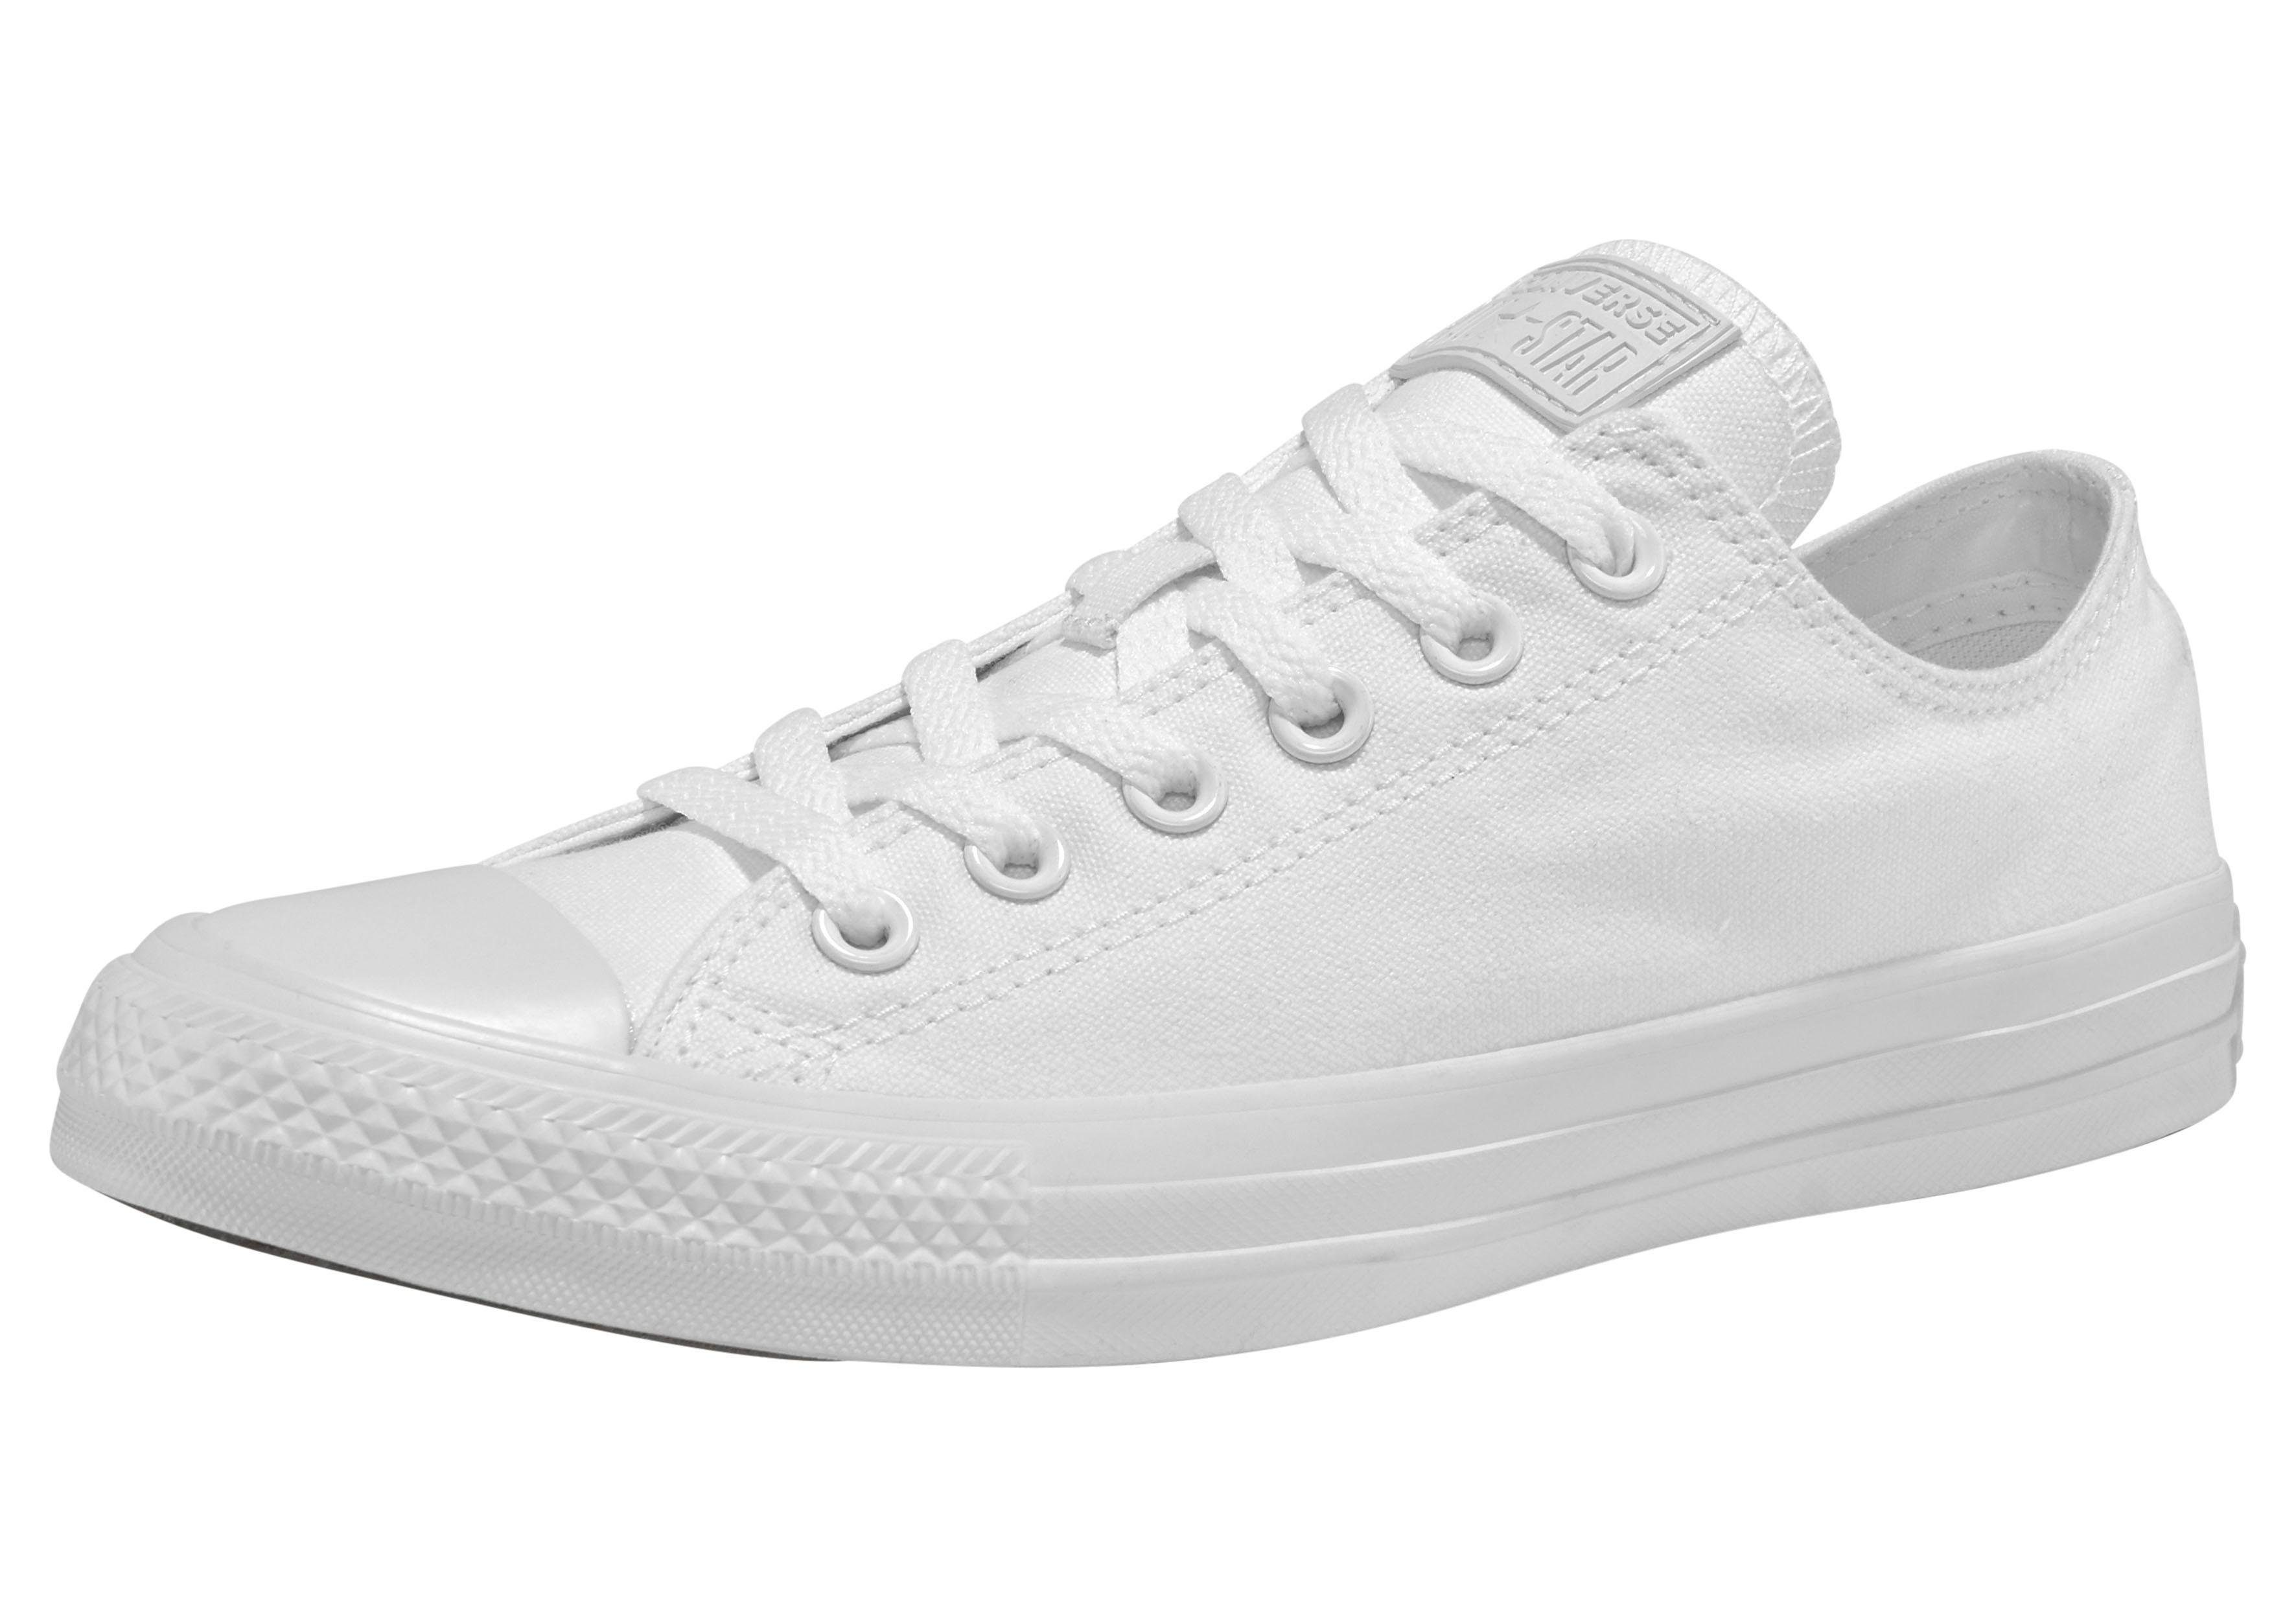 Converse »Chuck Taylor All Star Seasonal Ox Monocrome« Sneaker online kaufen | OTTO